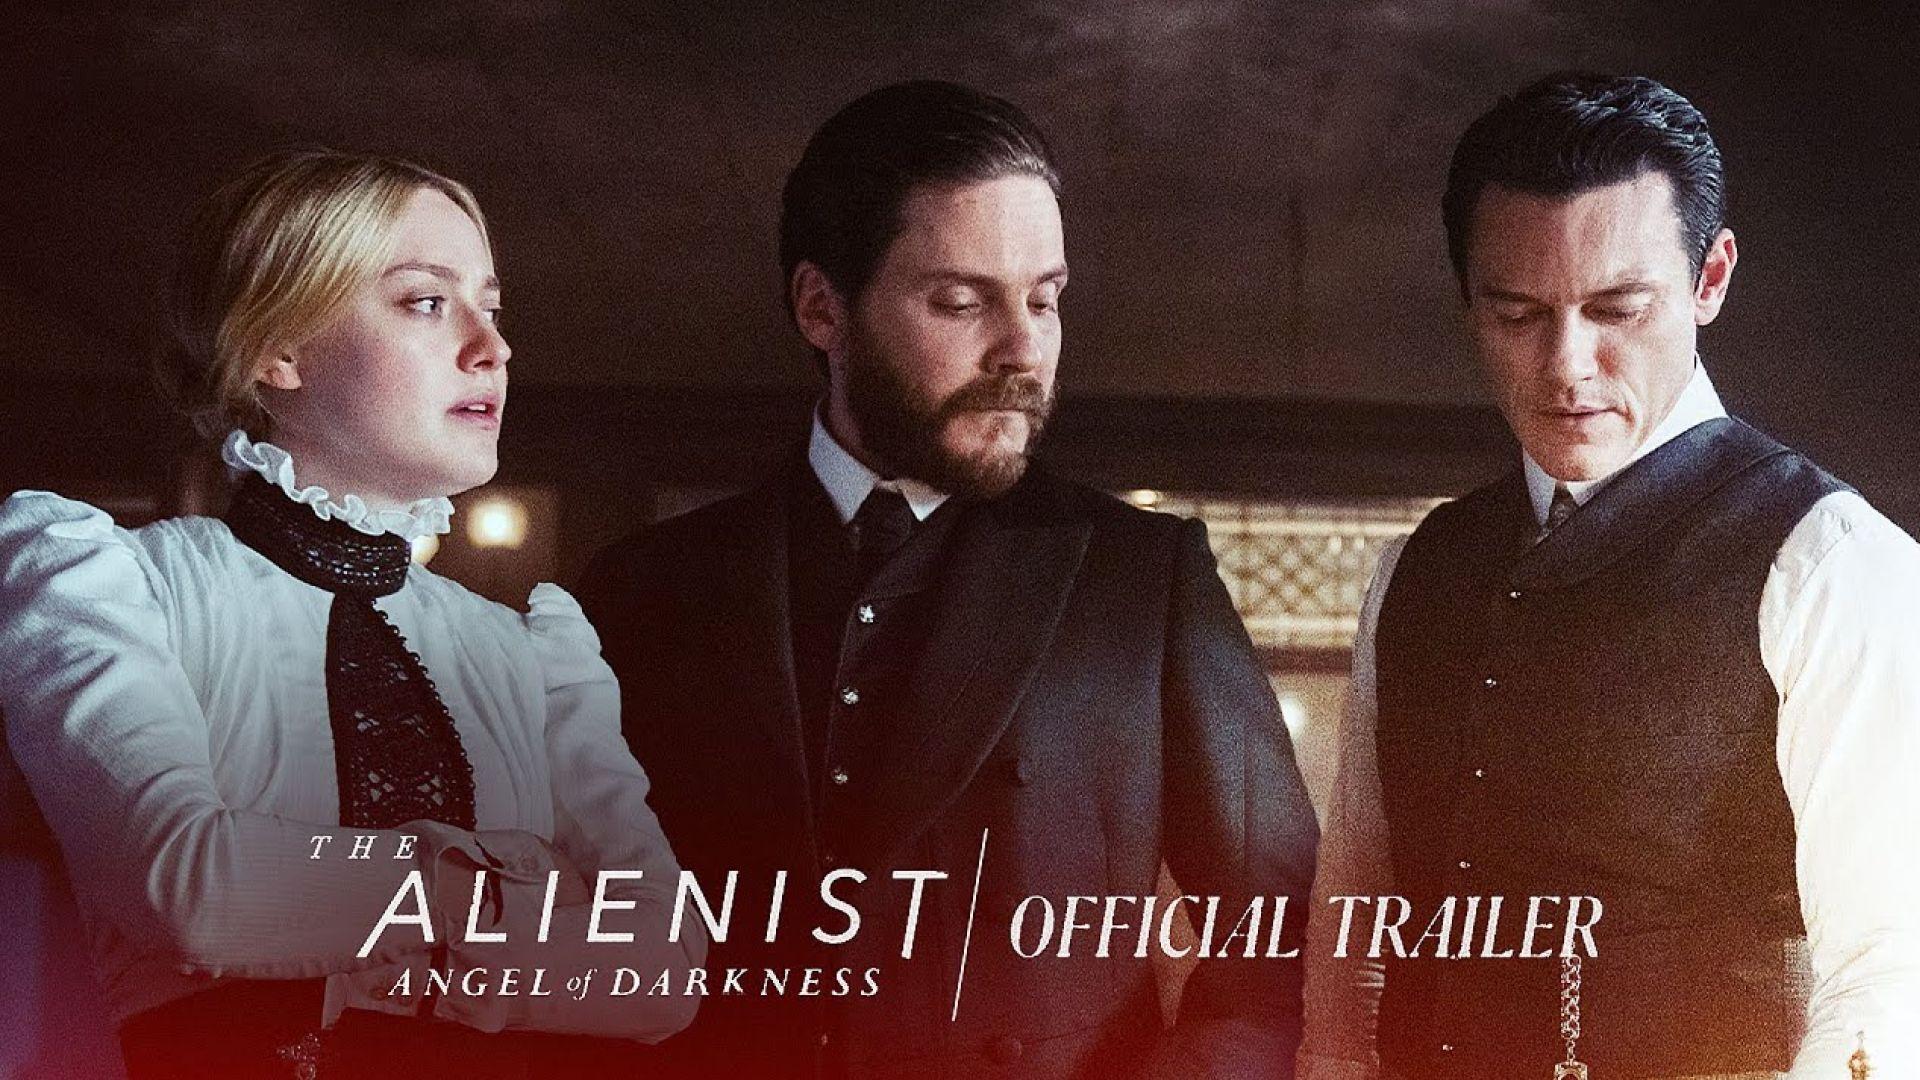 'The Alienist: Angel of Darkness' Trailer